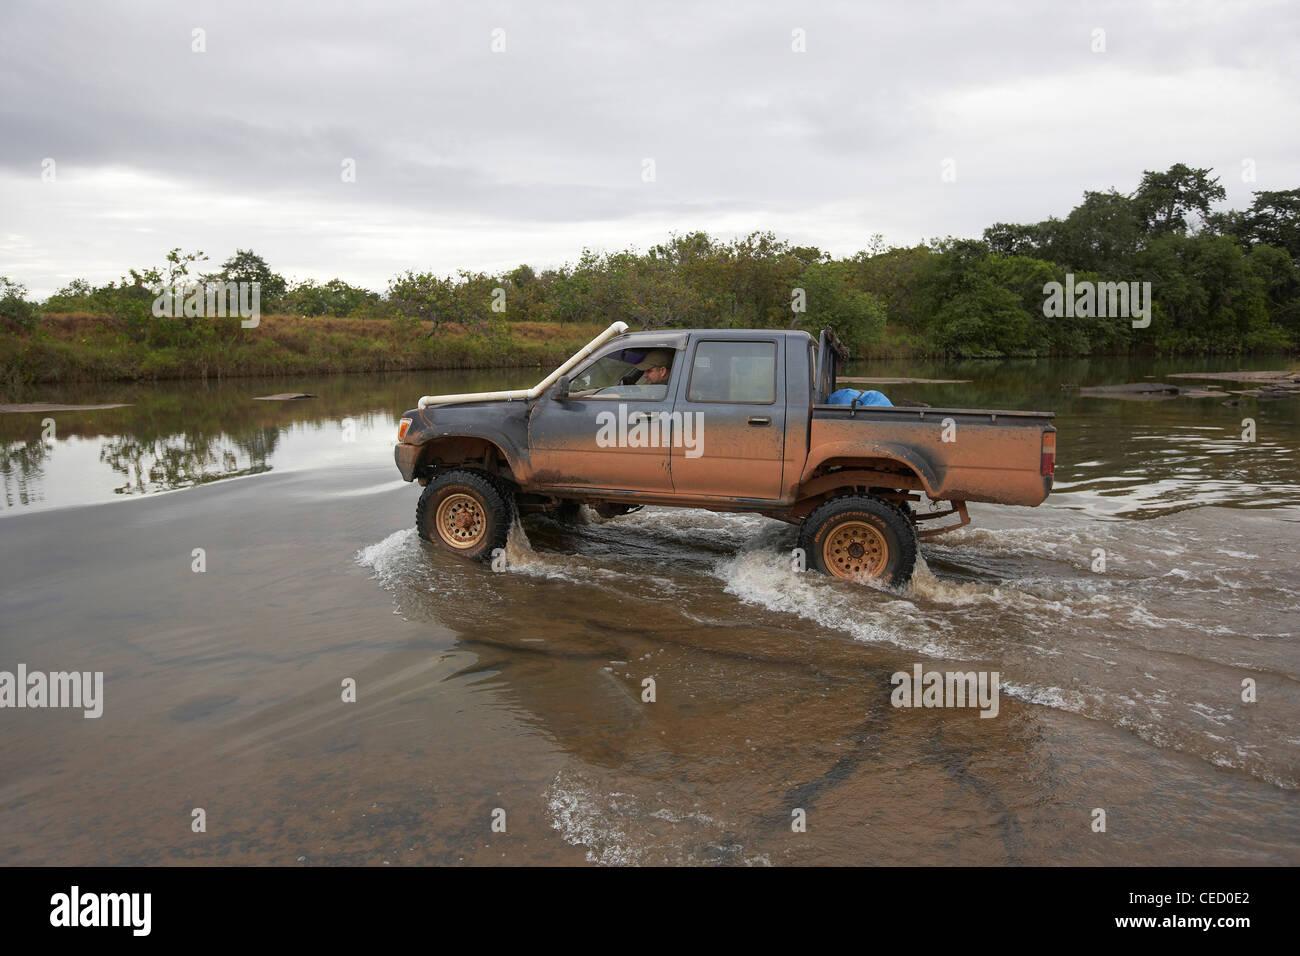 4x4 vehicle fording a river in the Rupununi Savannah, Guyana. - Stock Image